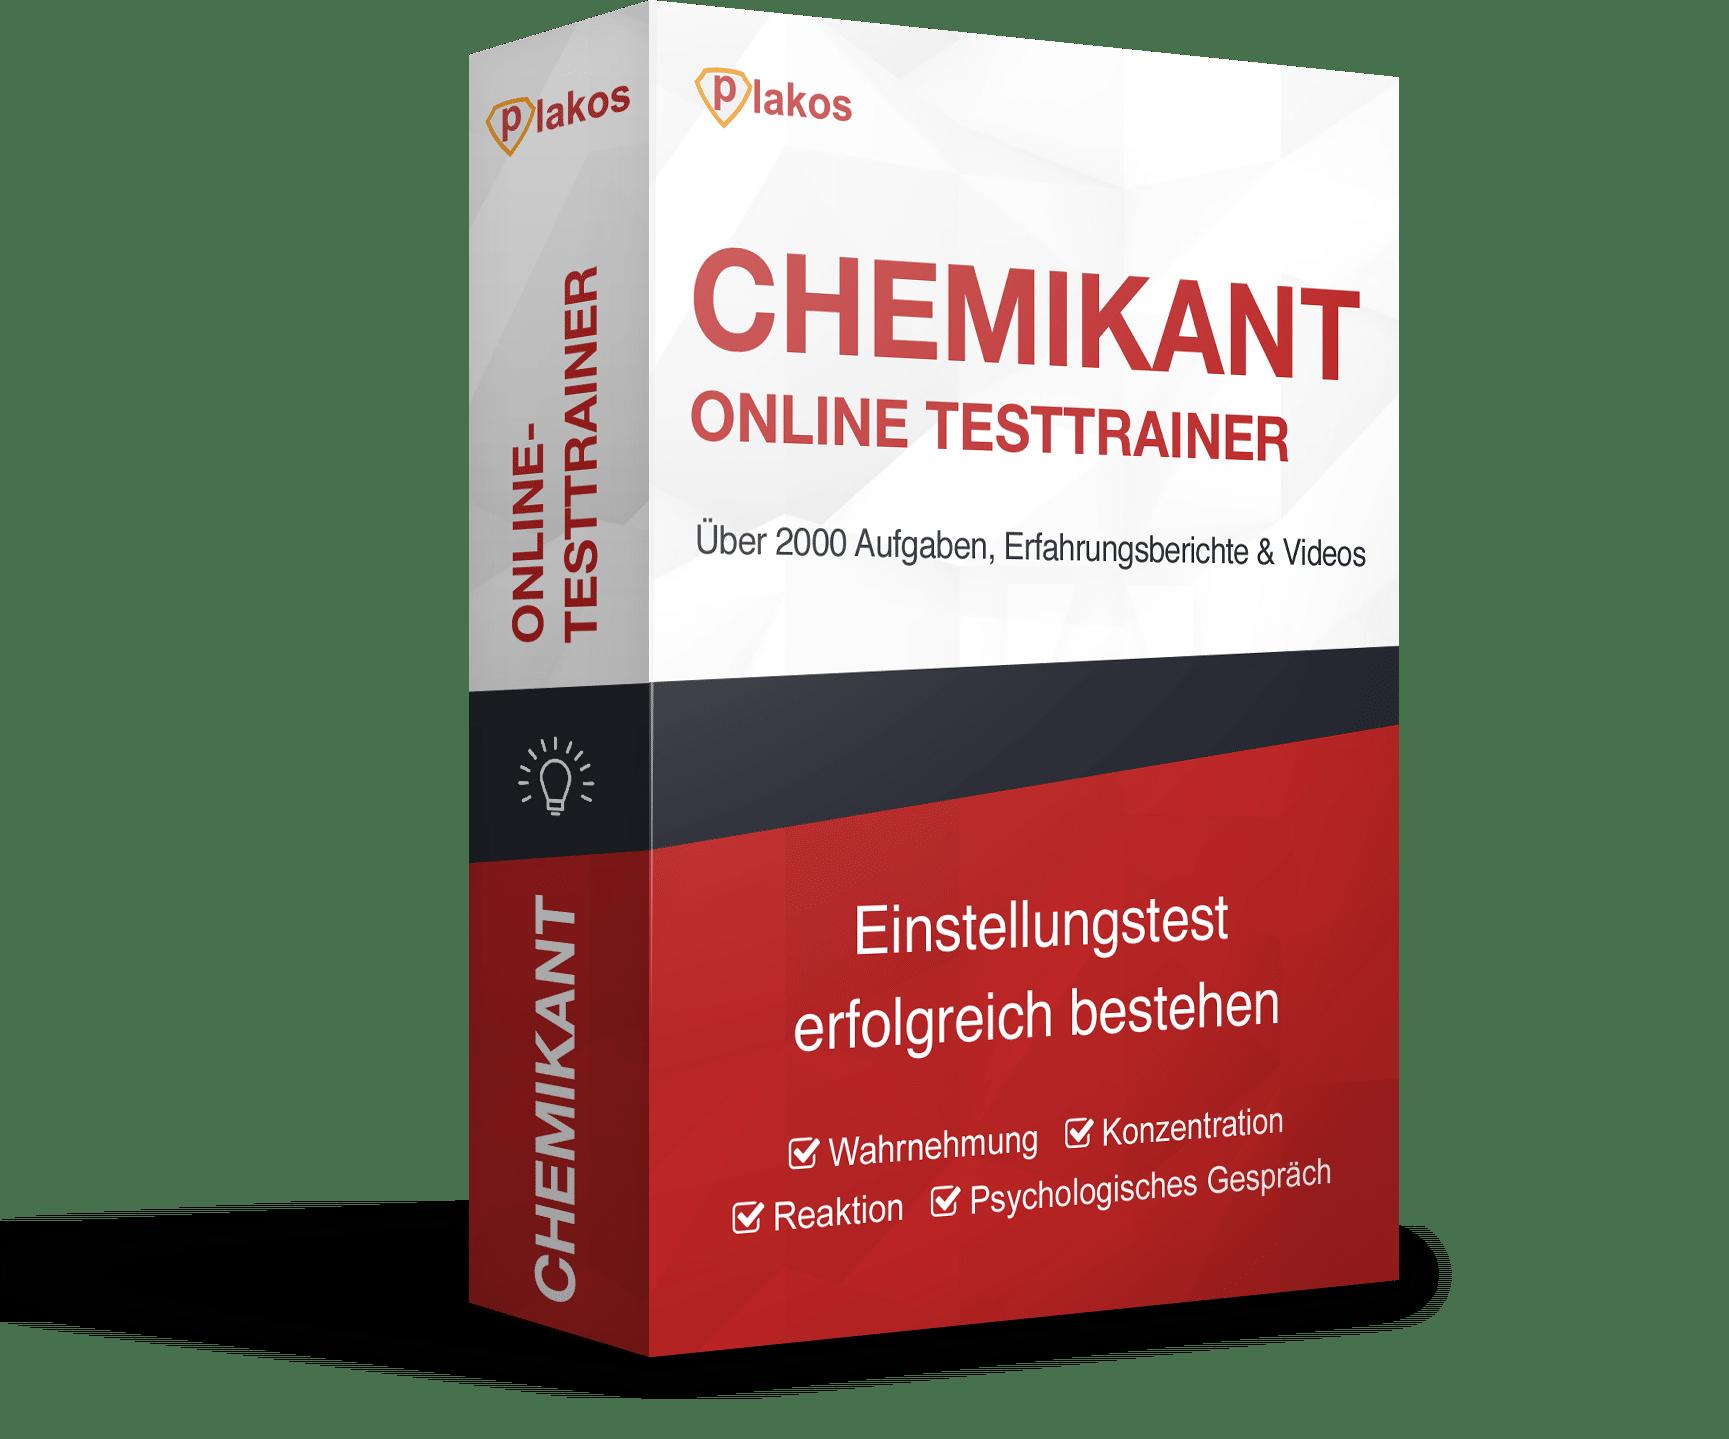 Chemikant Online Testtrainer